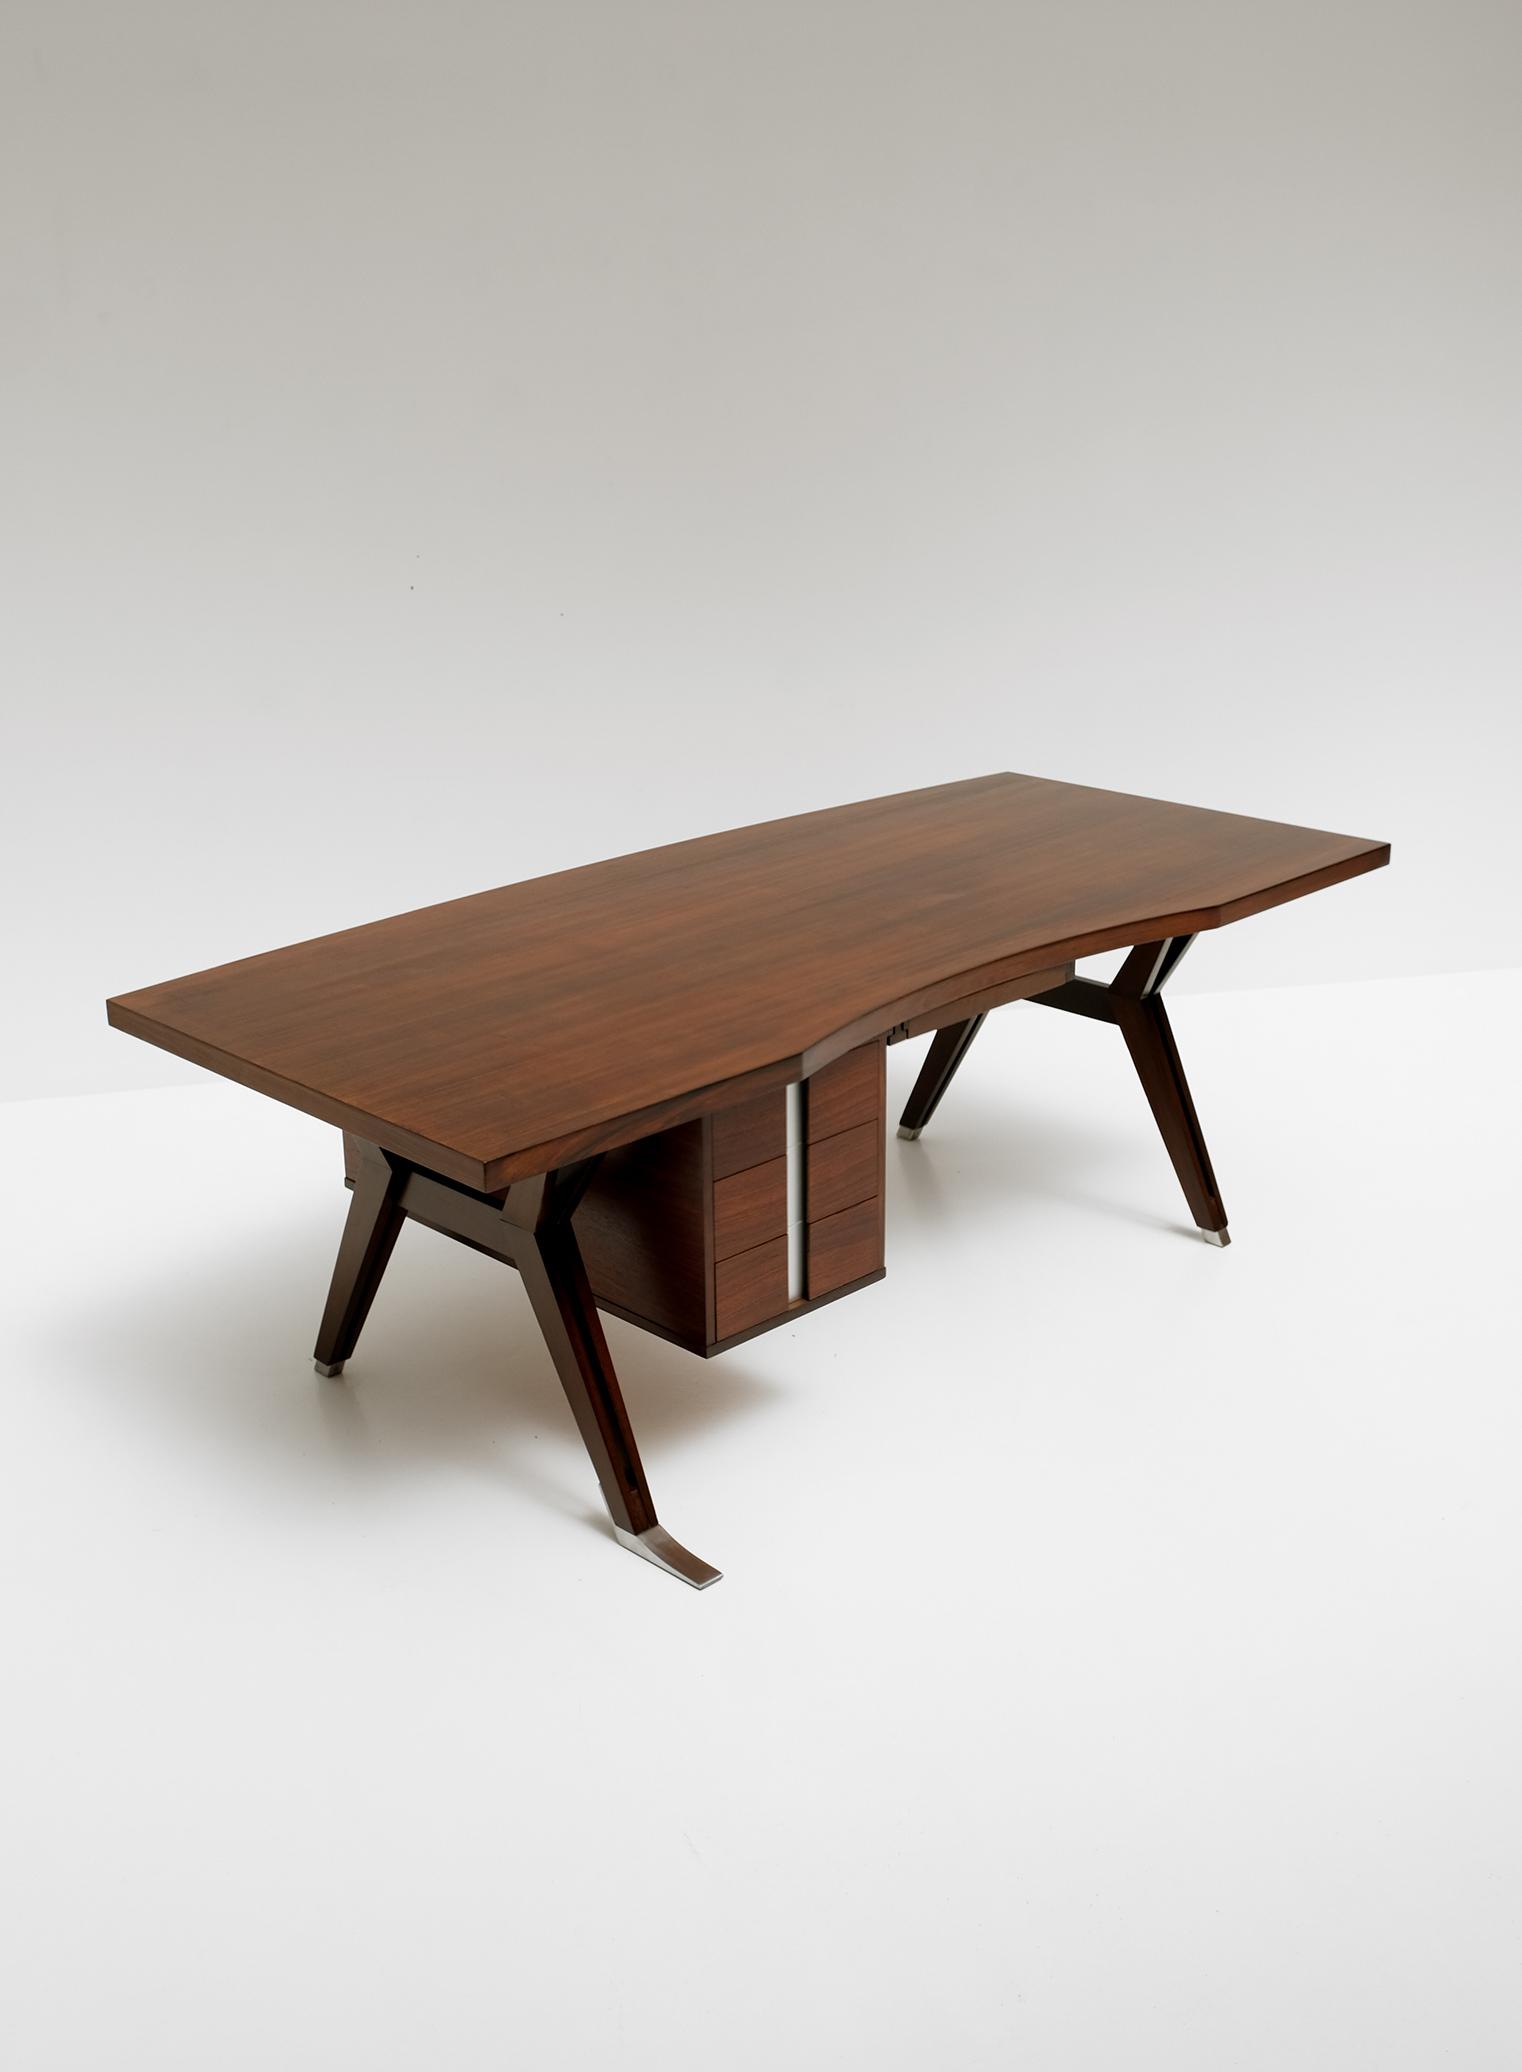 Executive Desk by Ico Parisi for MIM 1958